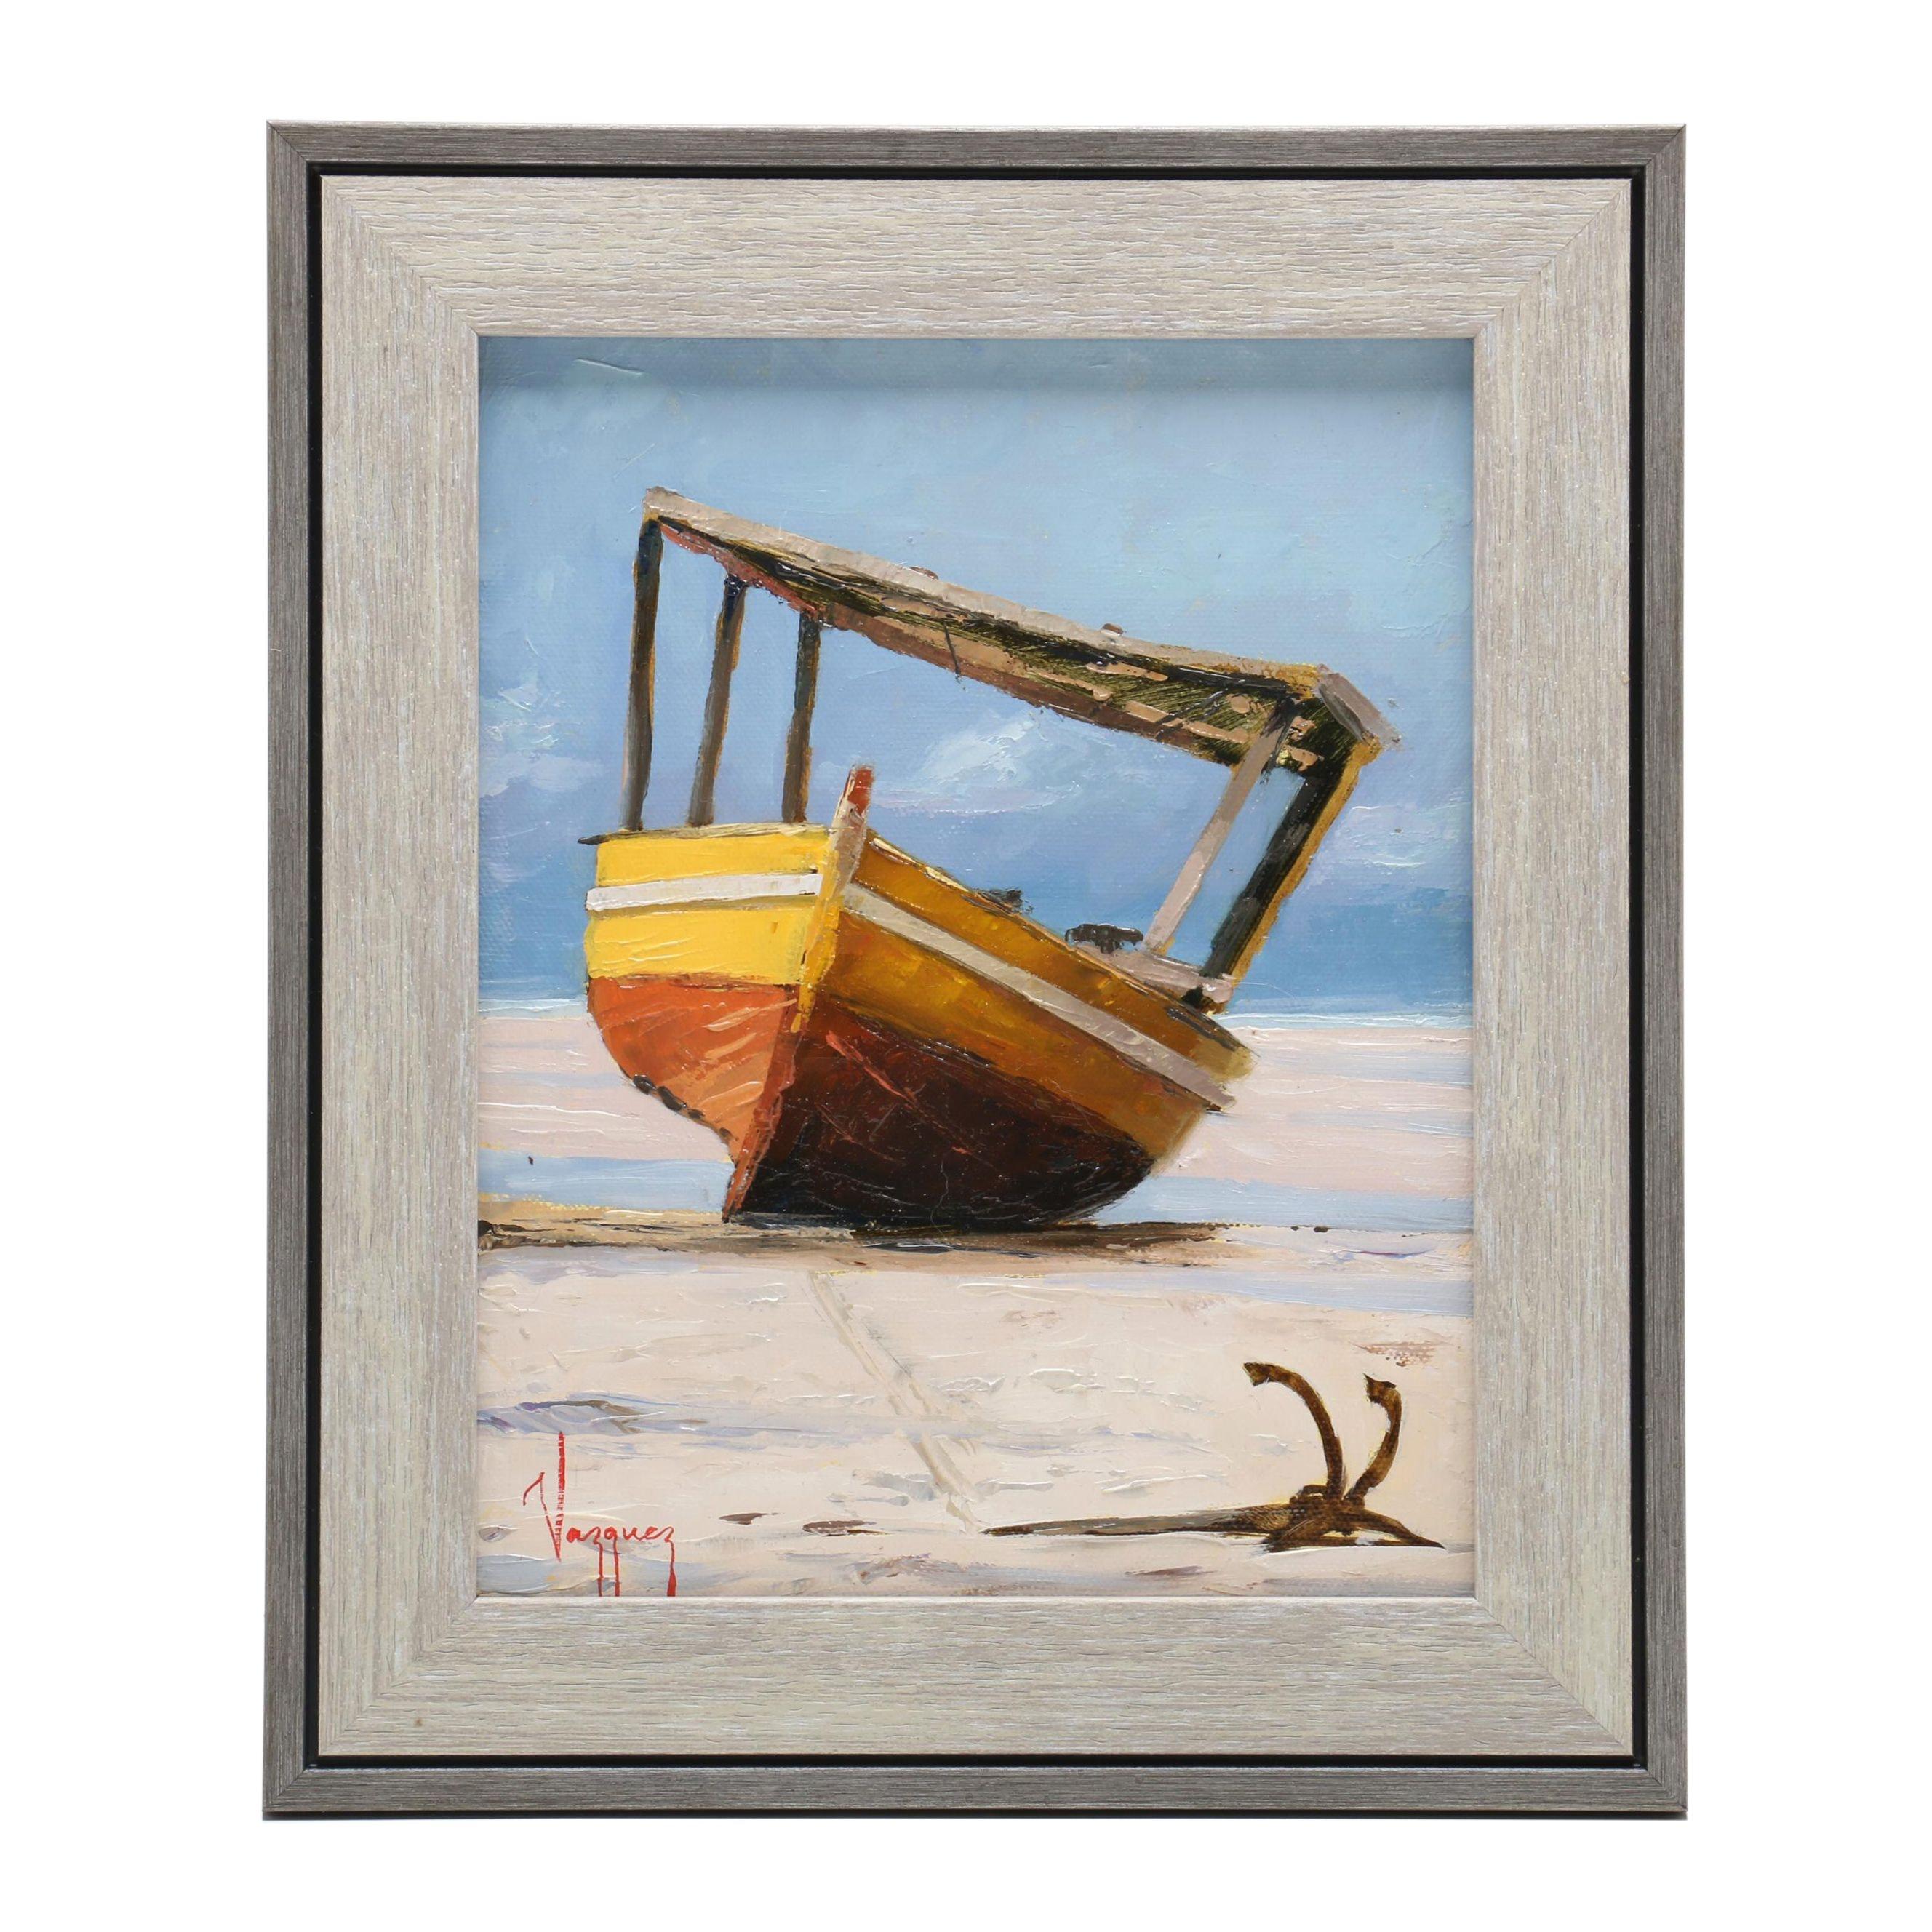 Marco Antonio Vazquez Oil Painting of Yellow Boat